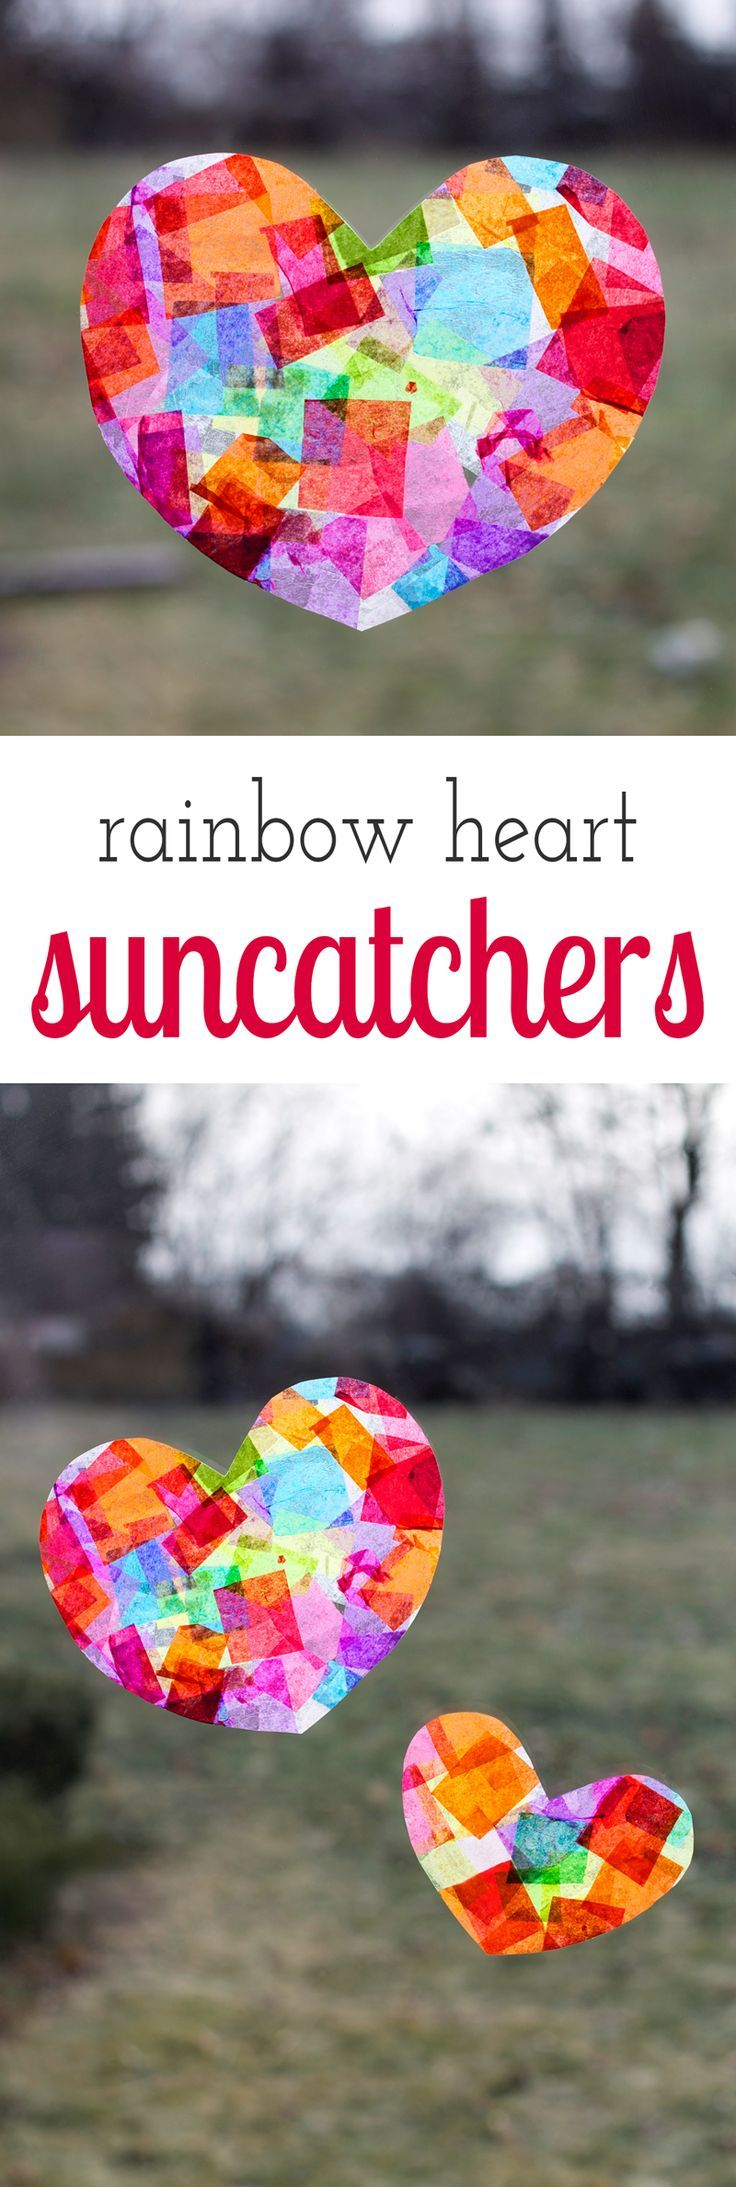 32 best valentines day images on pinterest day care kids rainbow heart suncatchers valentines crafts for preschoolerstoddler jeuxipadfo Gallery